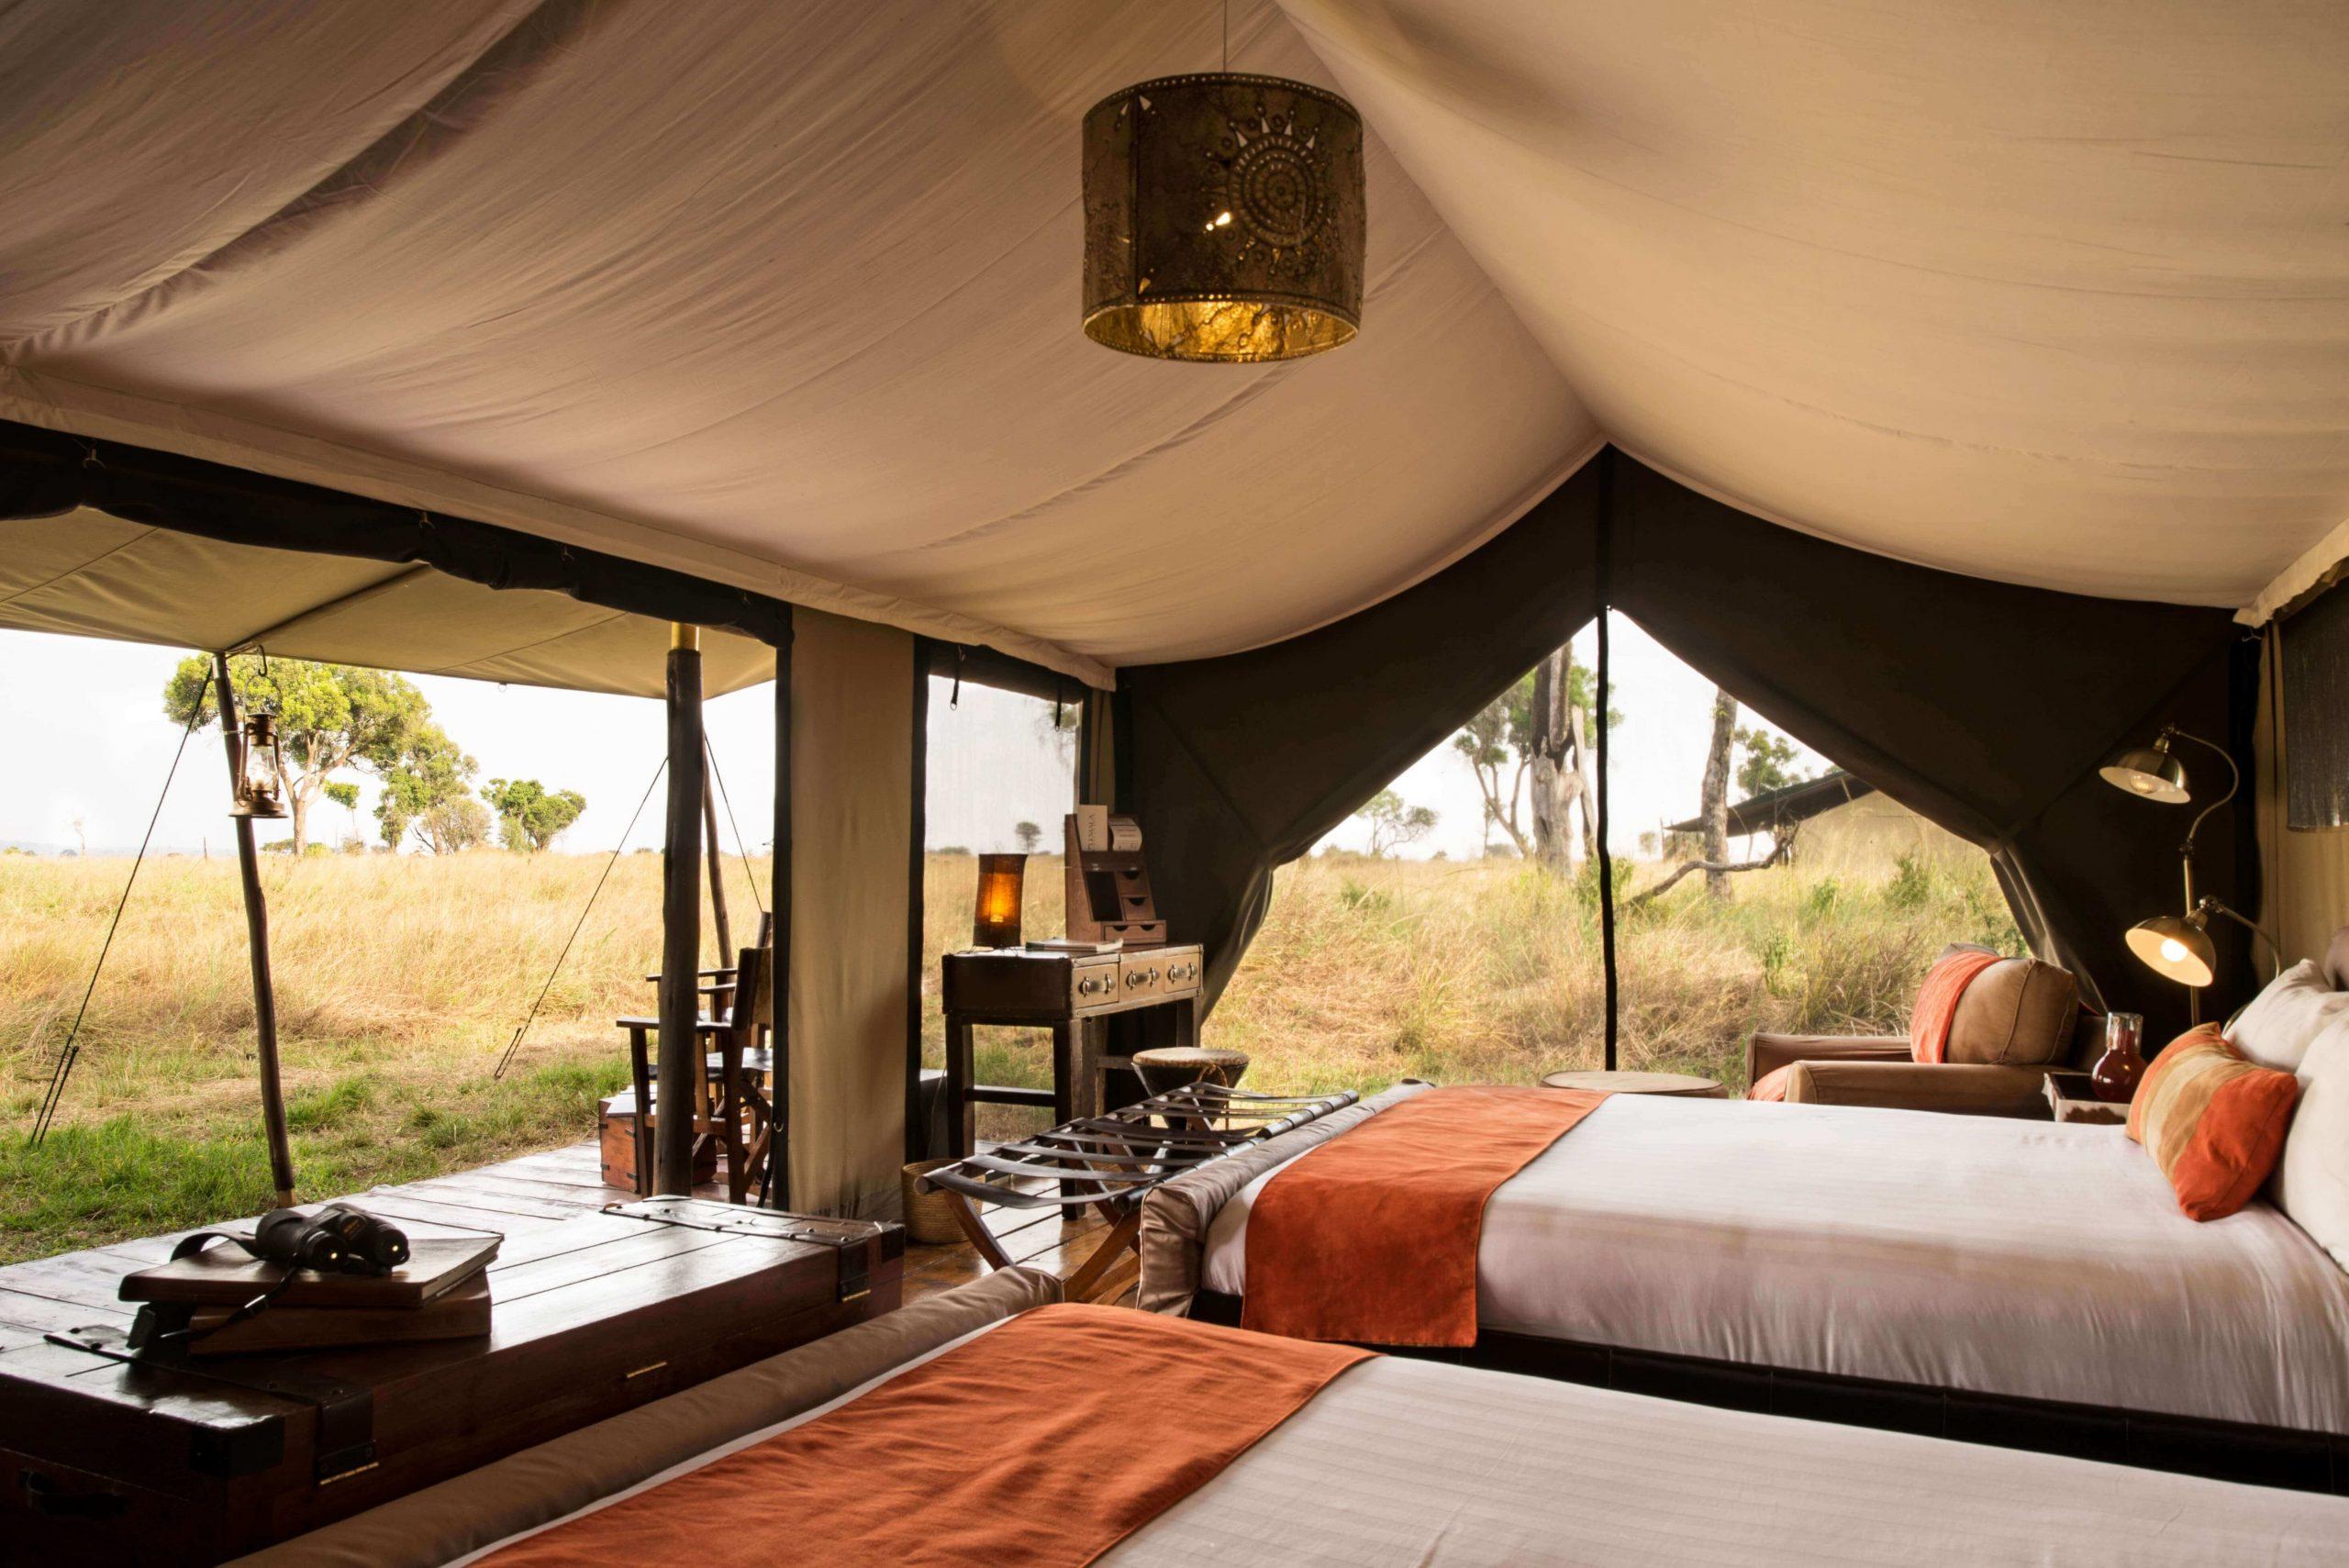 Mara & Ndutu Tented Camp